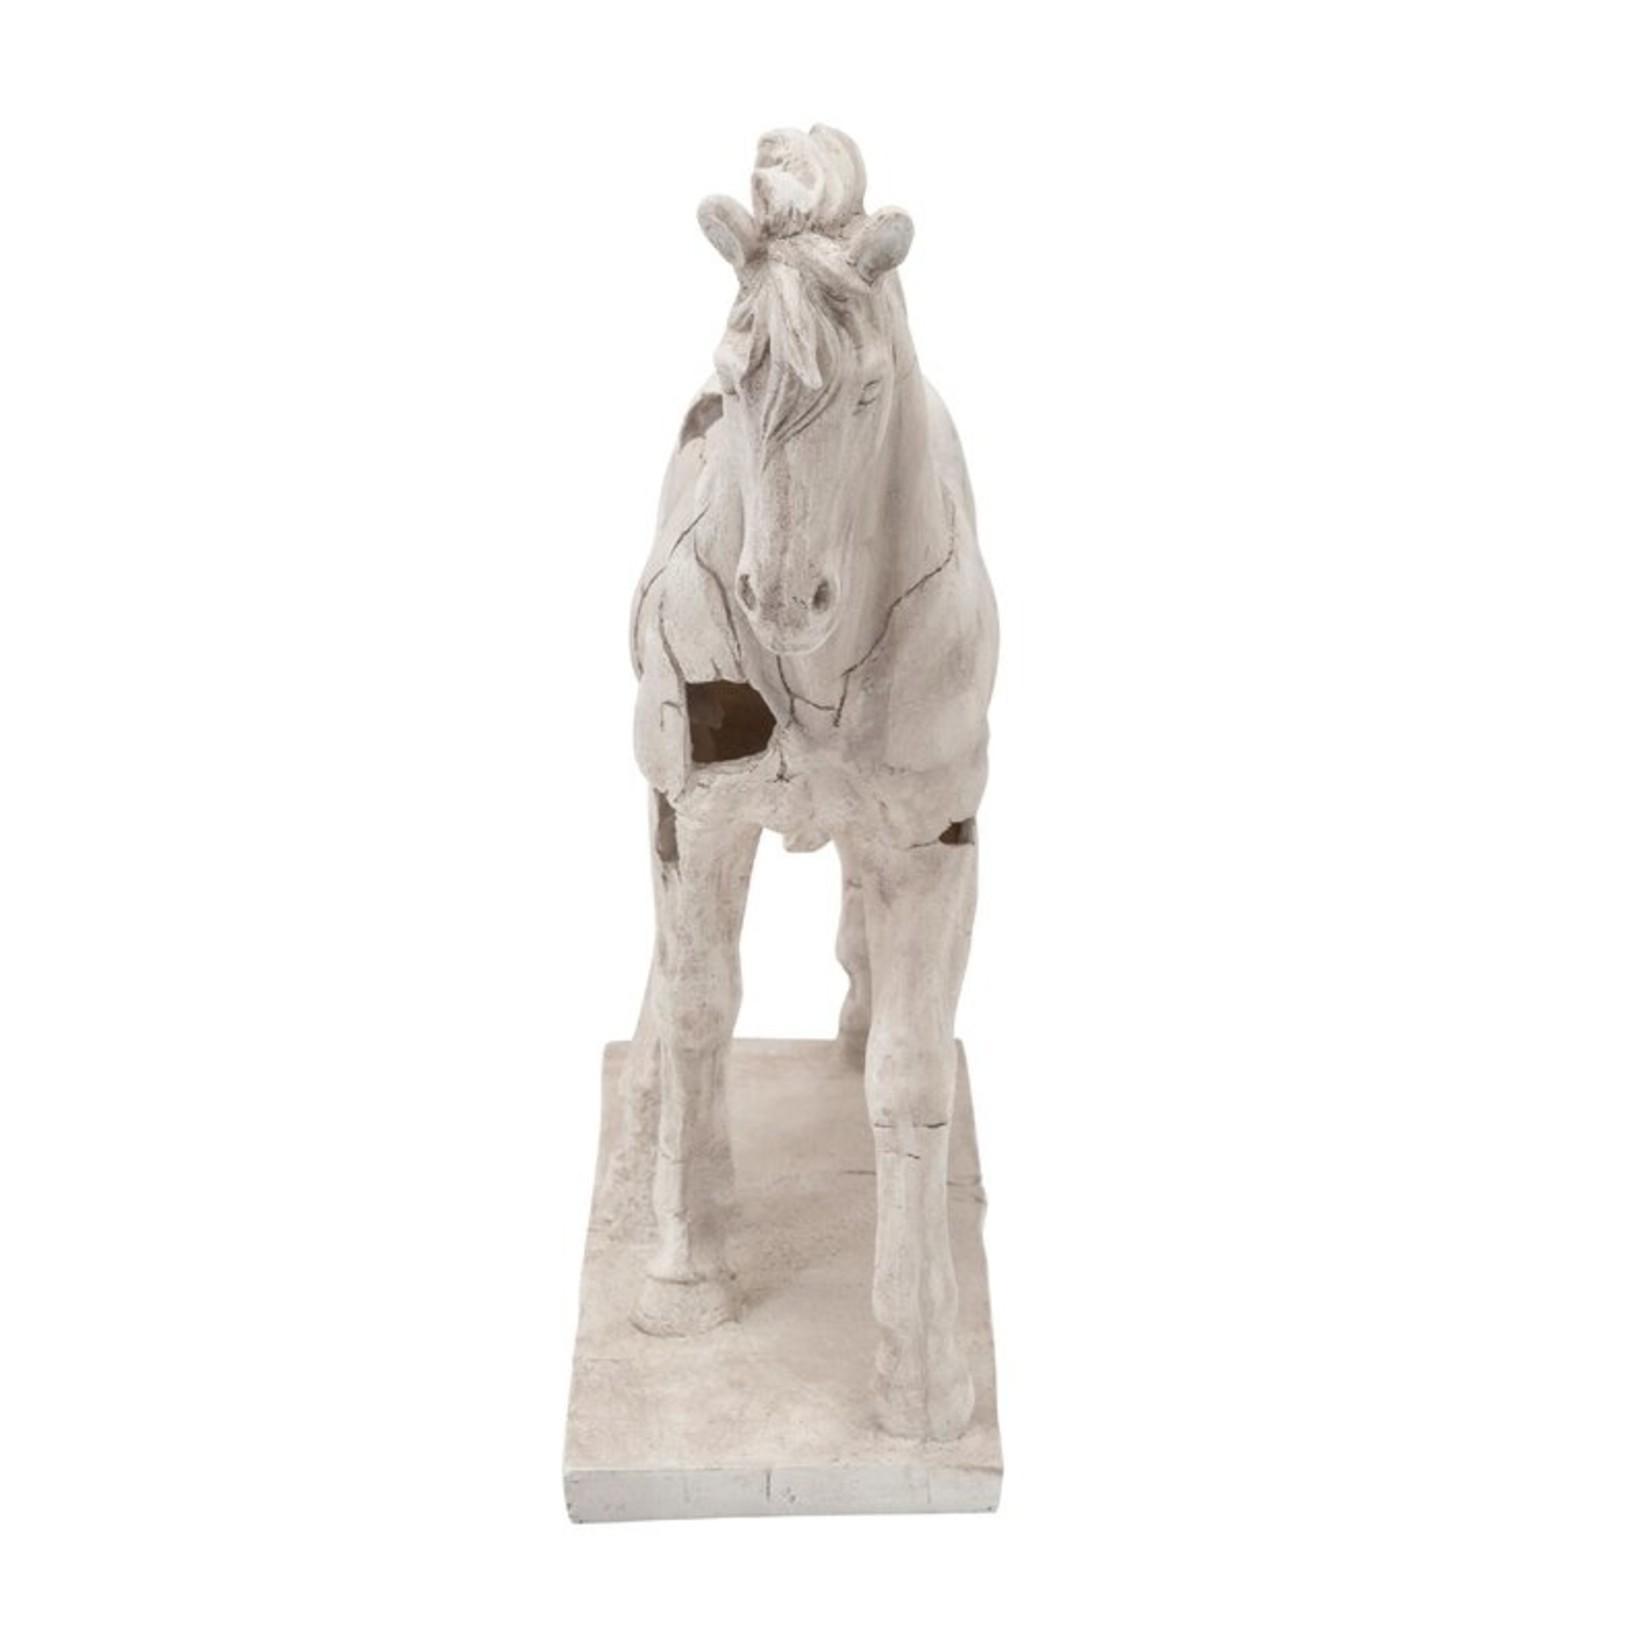 *Cracked Horse Sculpture - White